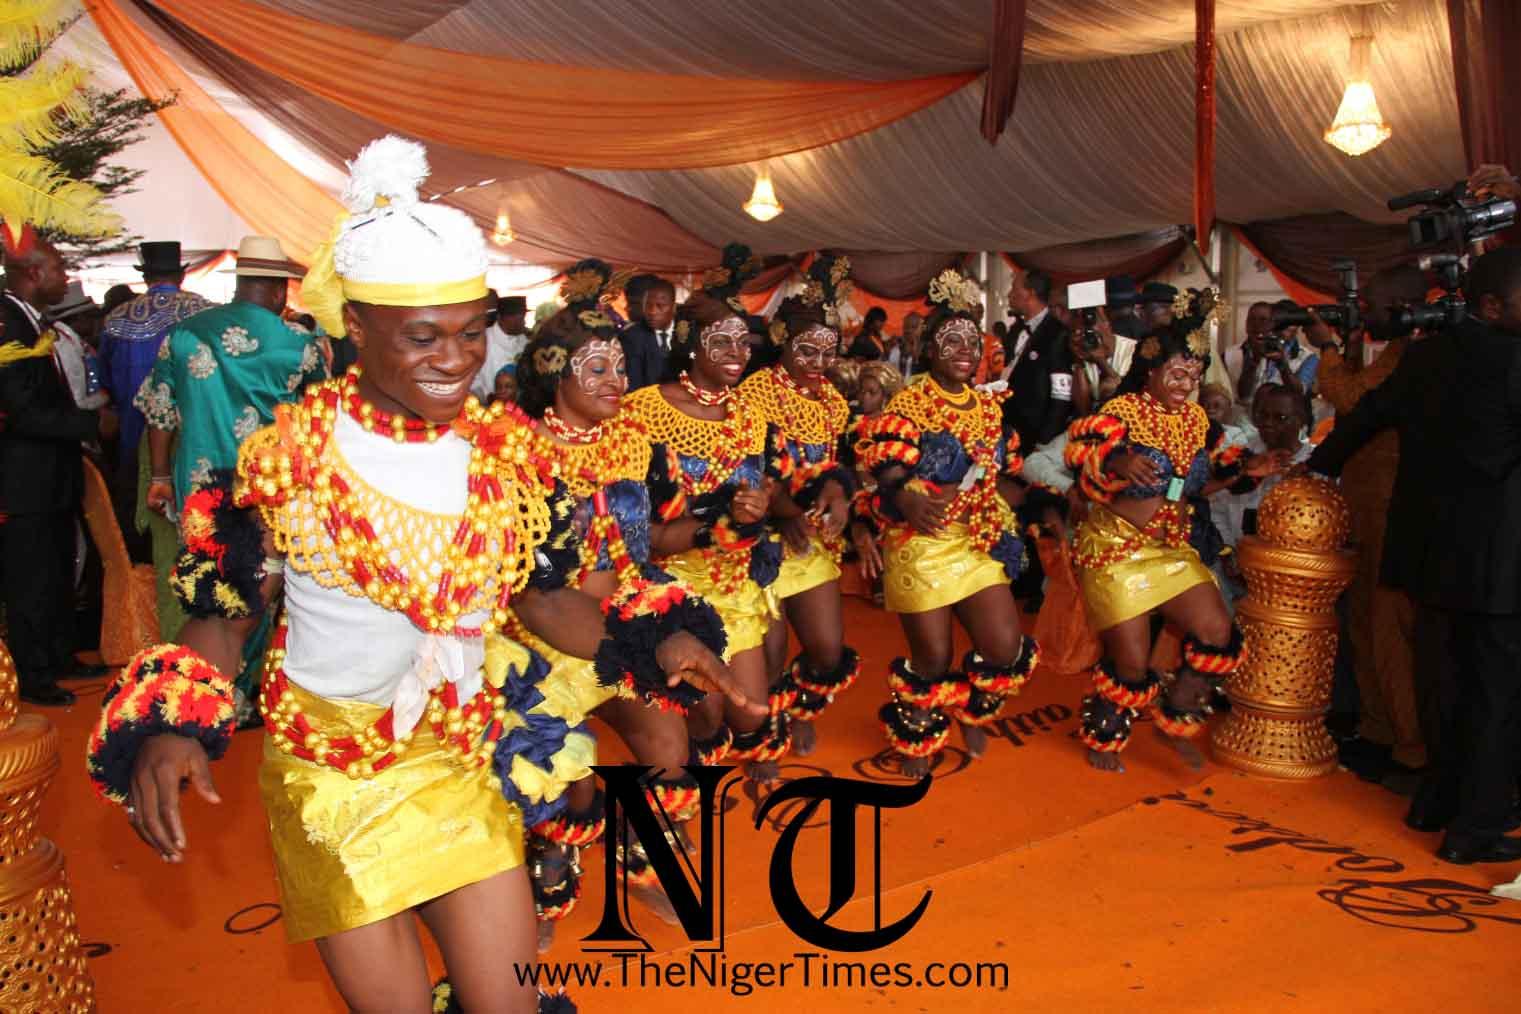 The-niger-times-godswill-faith-wedding-Traditional-Bayelsa-goddluck-33.jpg